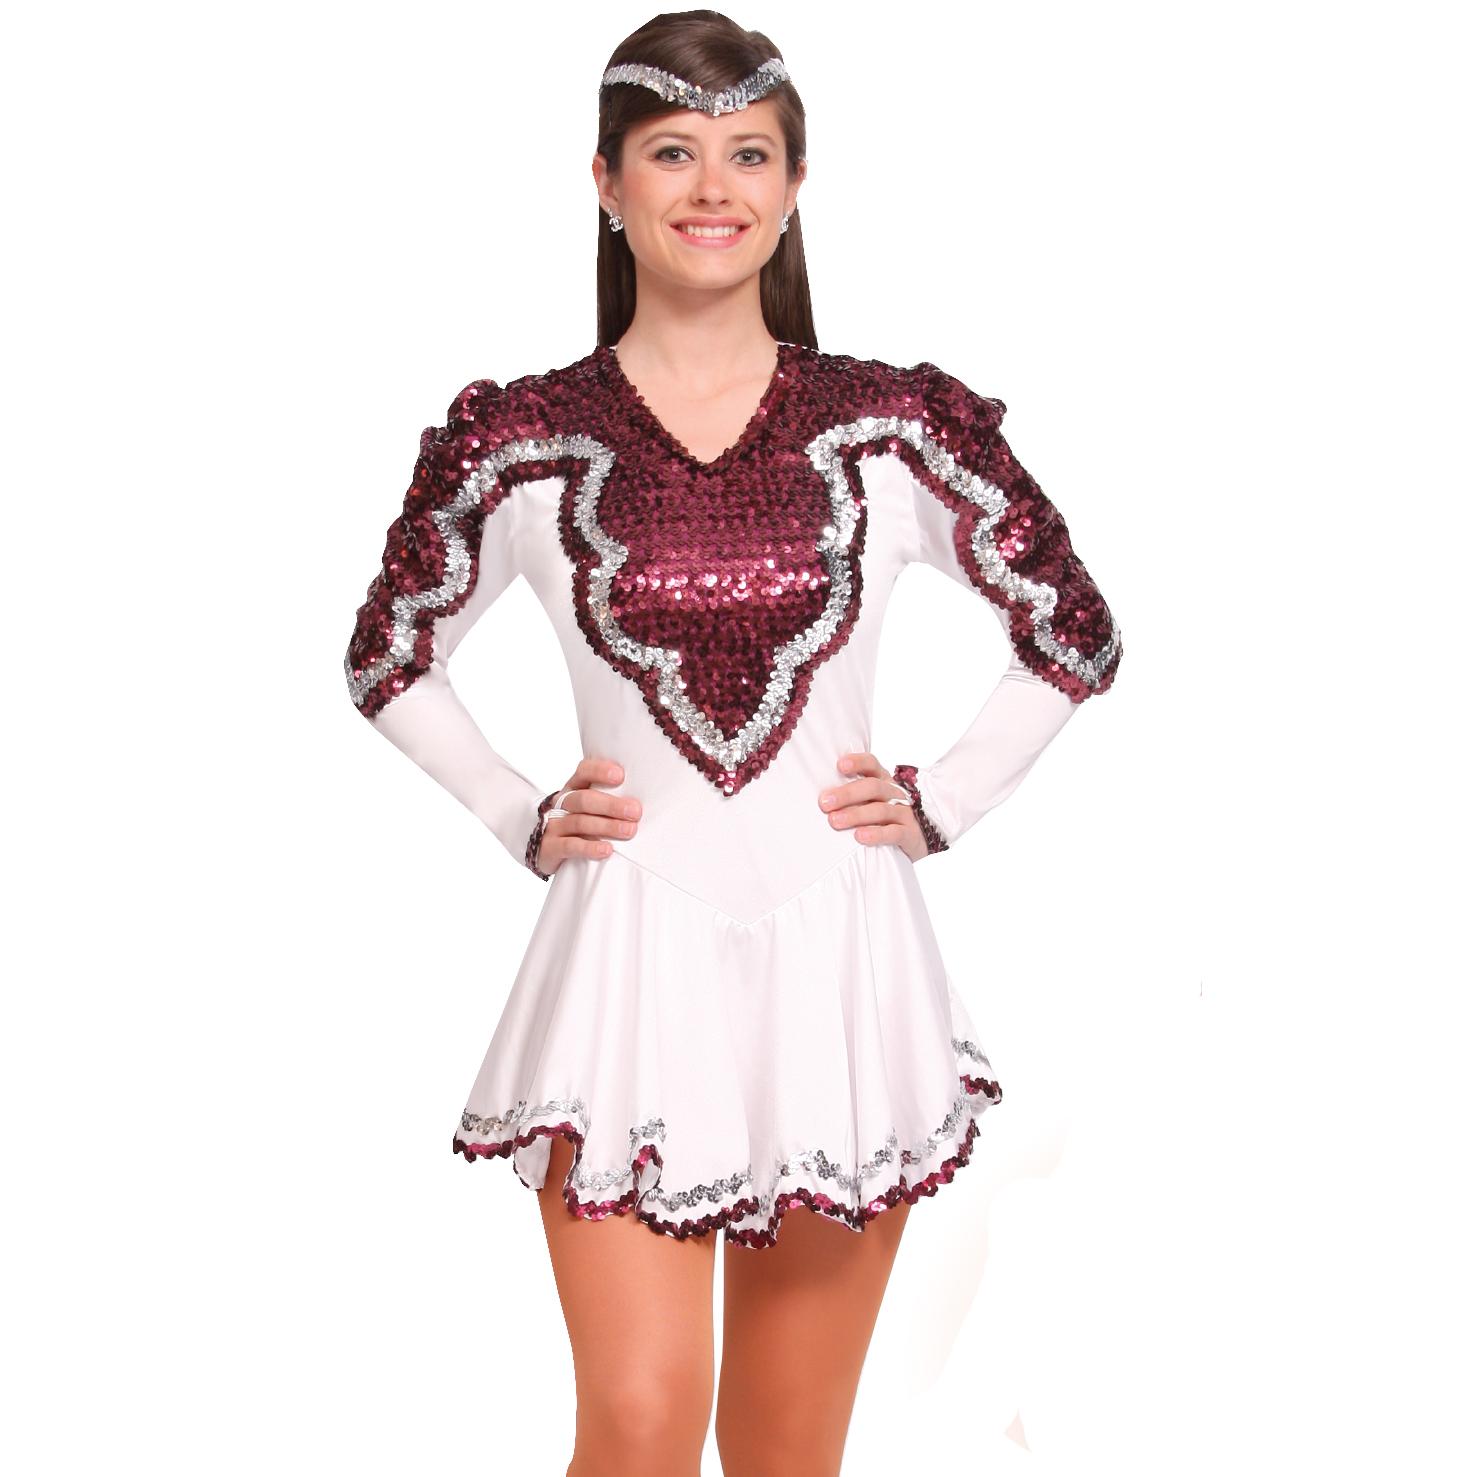 Guard Uniforms: Style 6067